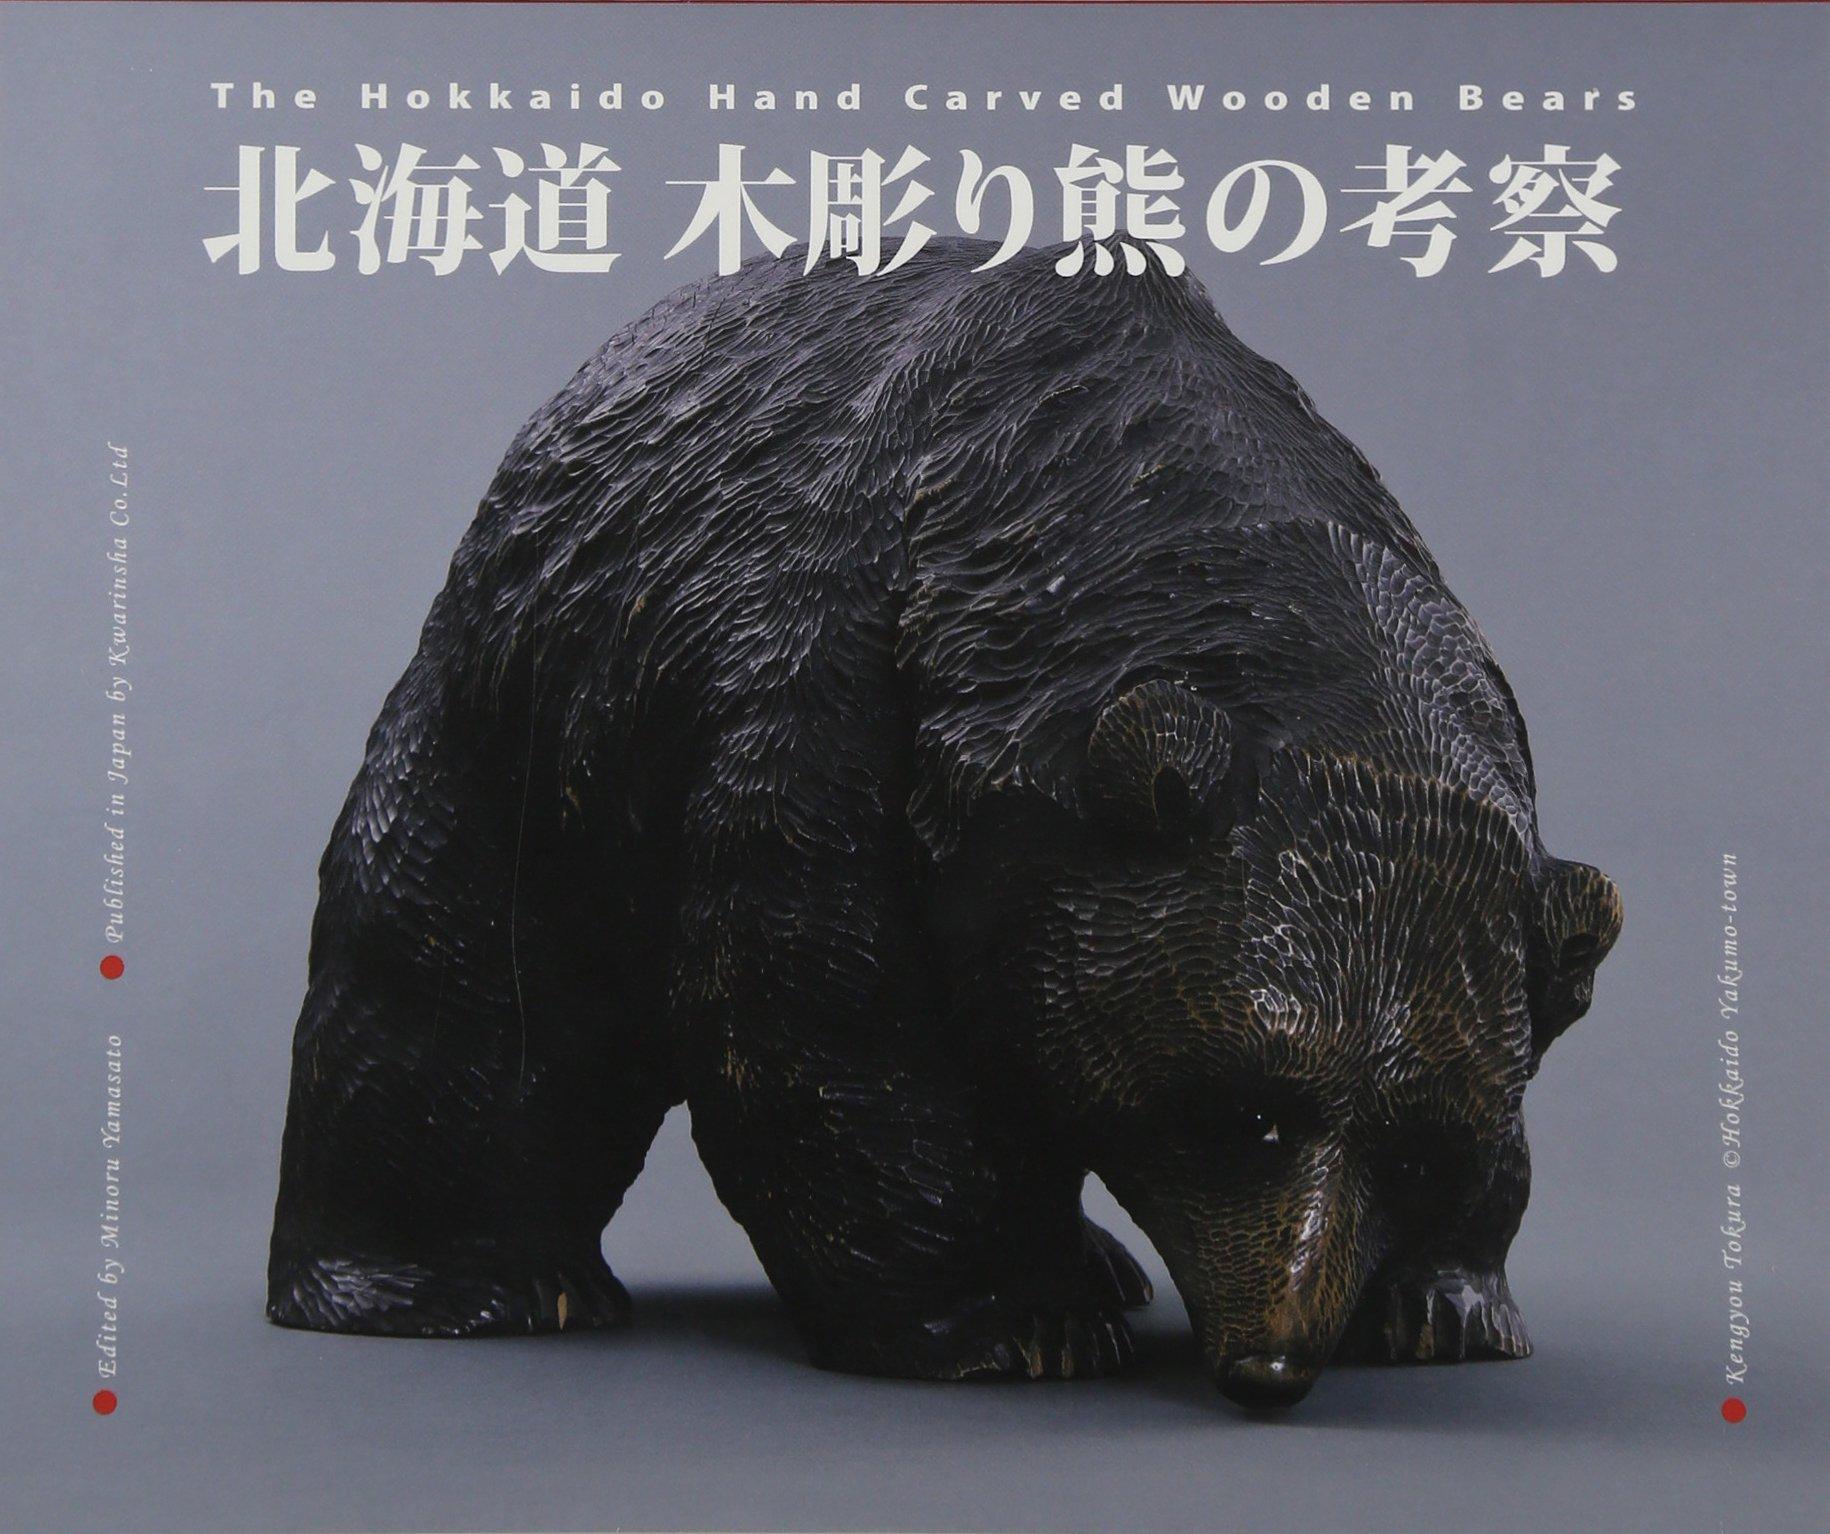 山里 稔:北海道 木彫り熊の考察 ☆☆☆☆・